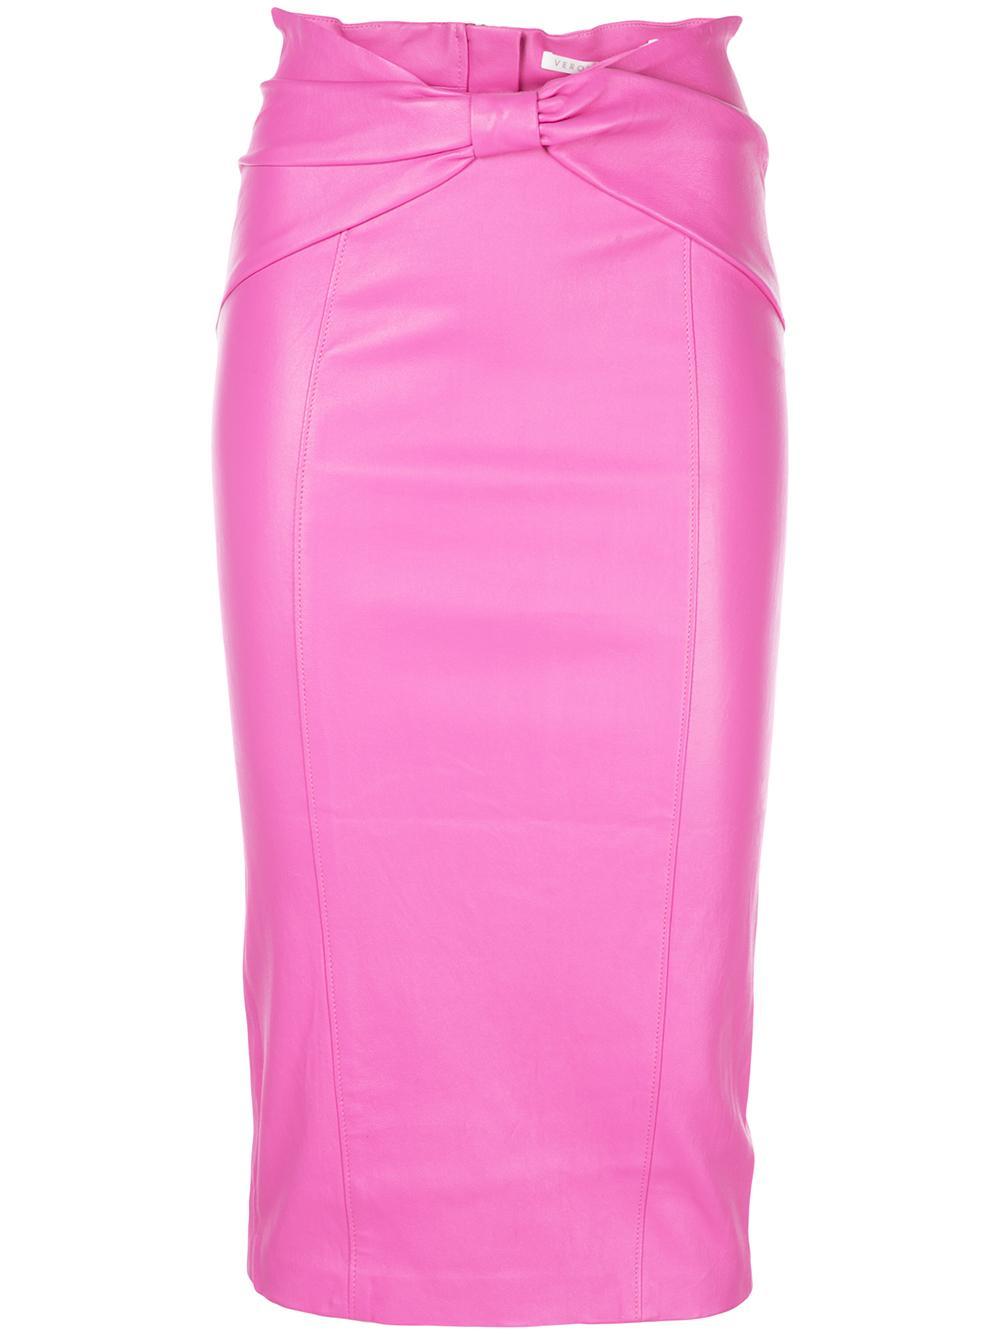 Carlyn Skirt Item # 1908LT0033244